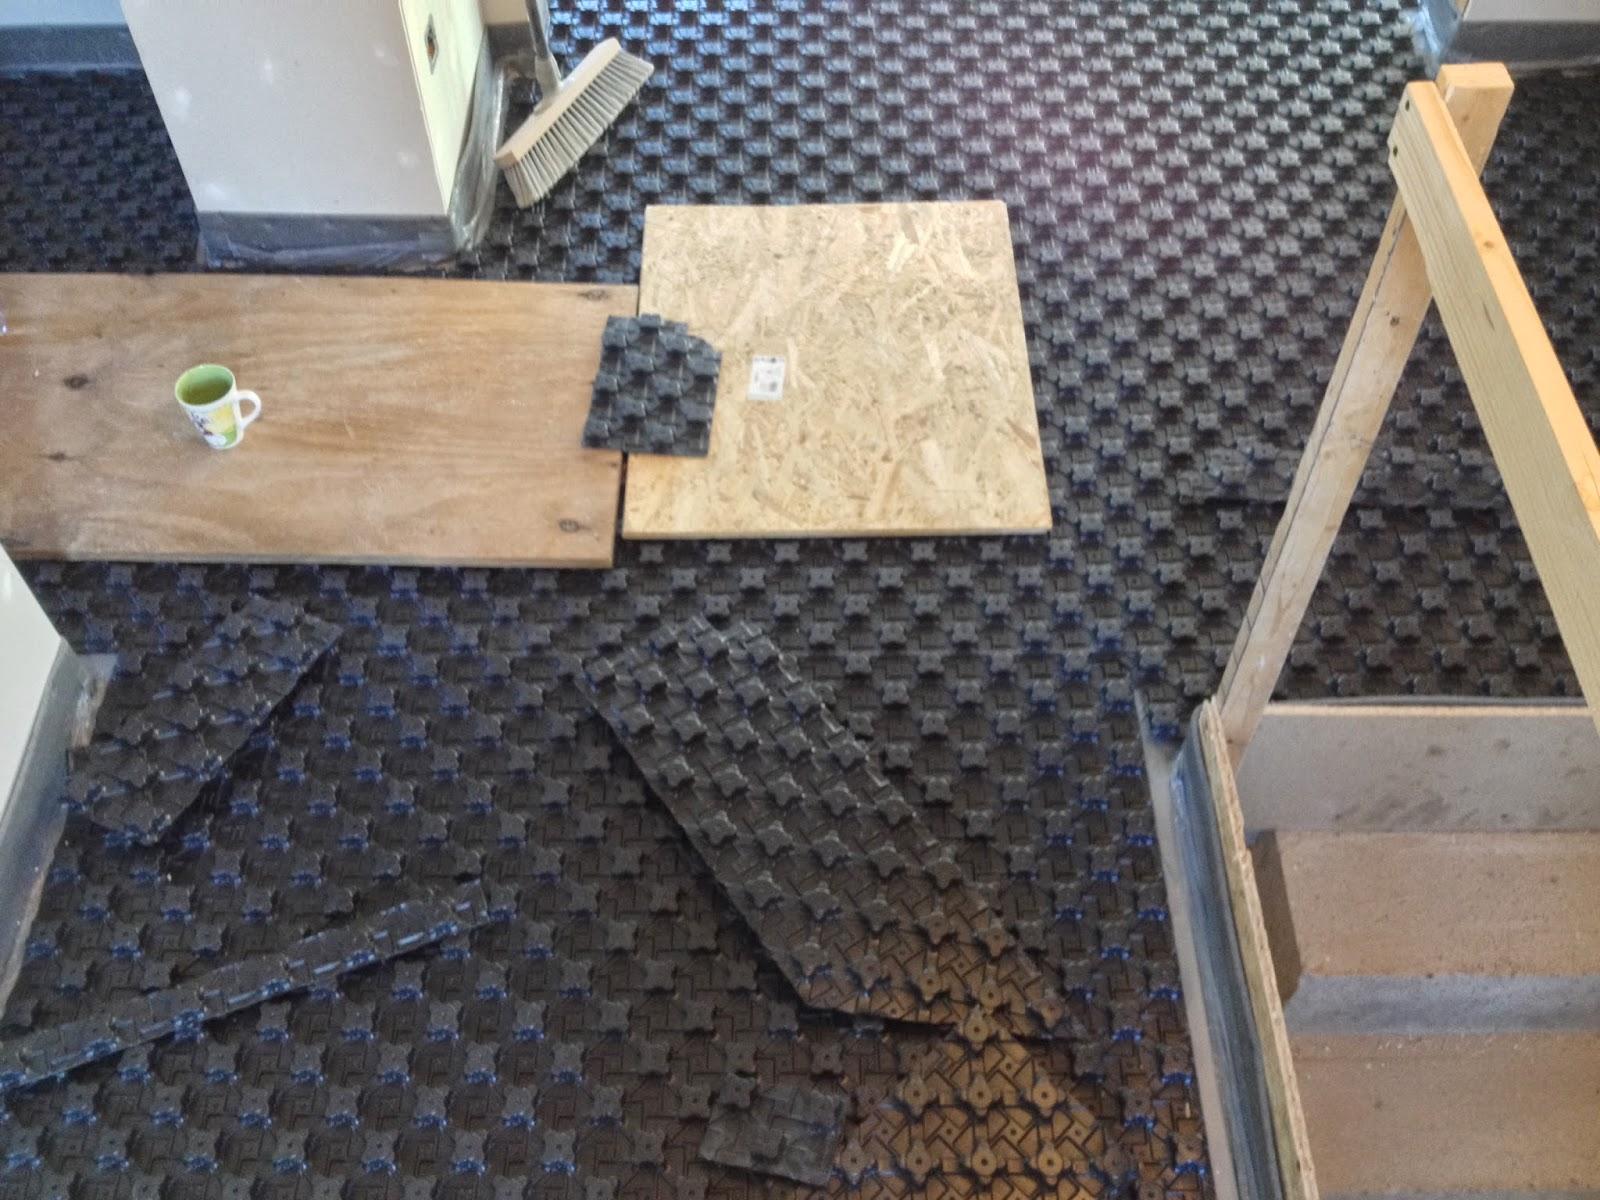 Bautagebuch Hassenroth Noppenplatten Noppenplatten Noppenplatten